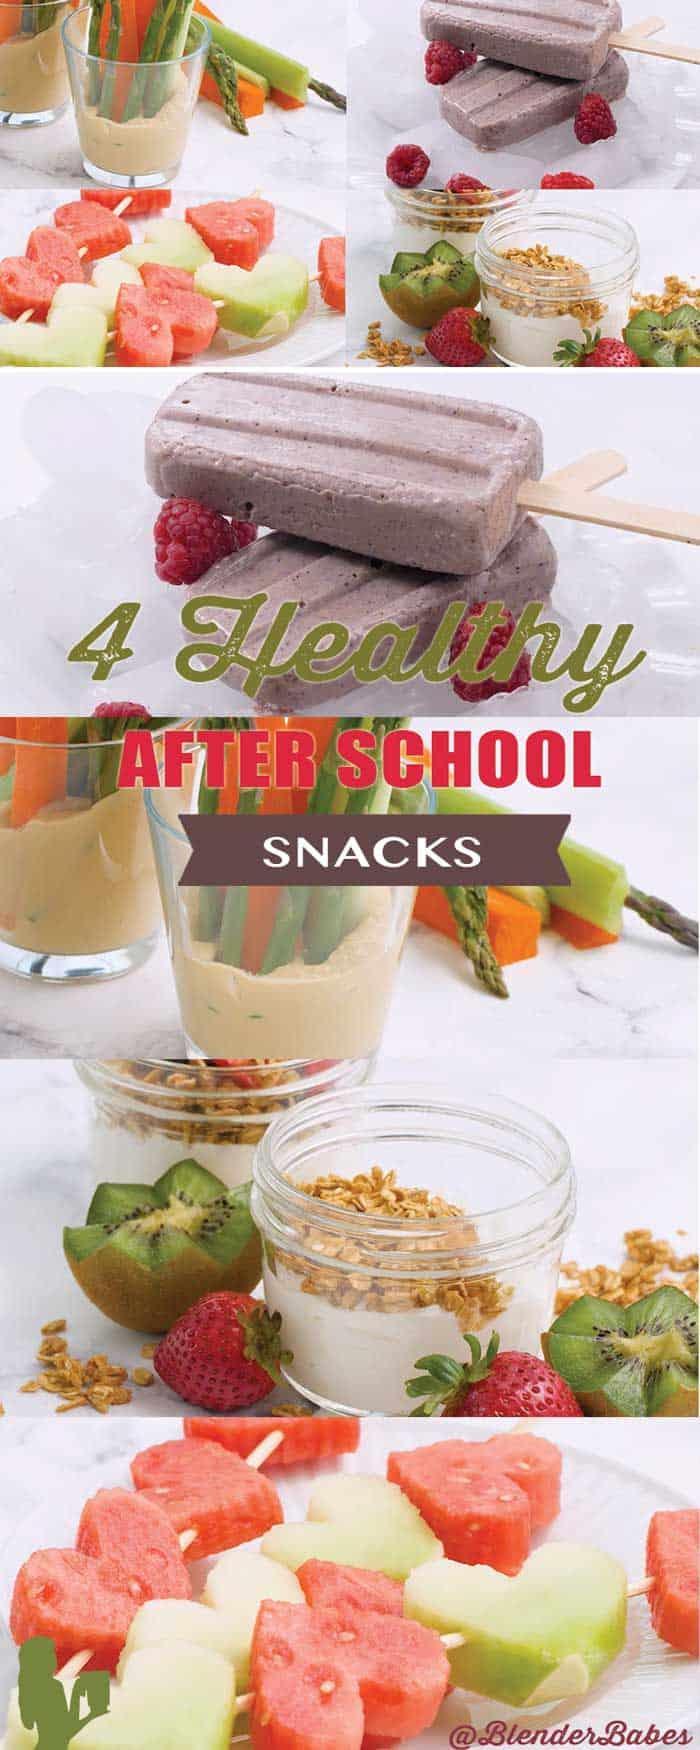 4 Easy Healthy After School Snacks for Kids by @BlenderBabes #snacks #snackideas #snacksforkids #healthysnacks #blenderbabes